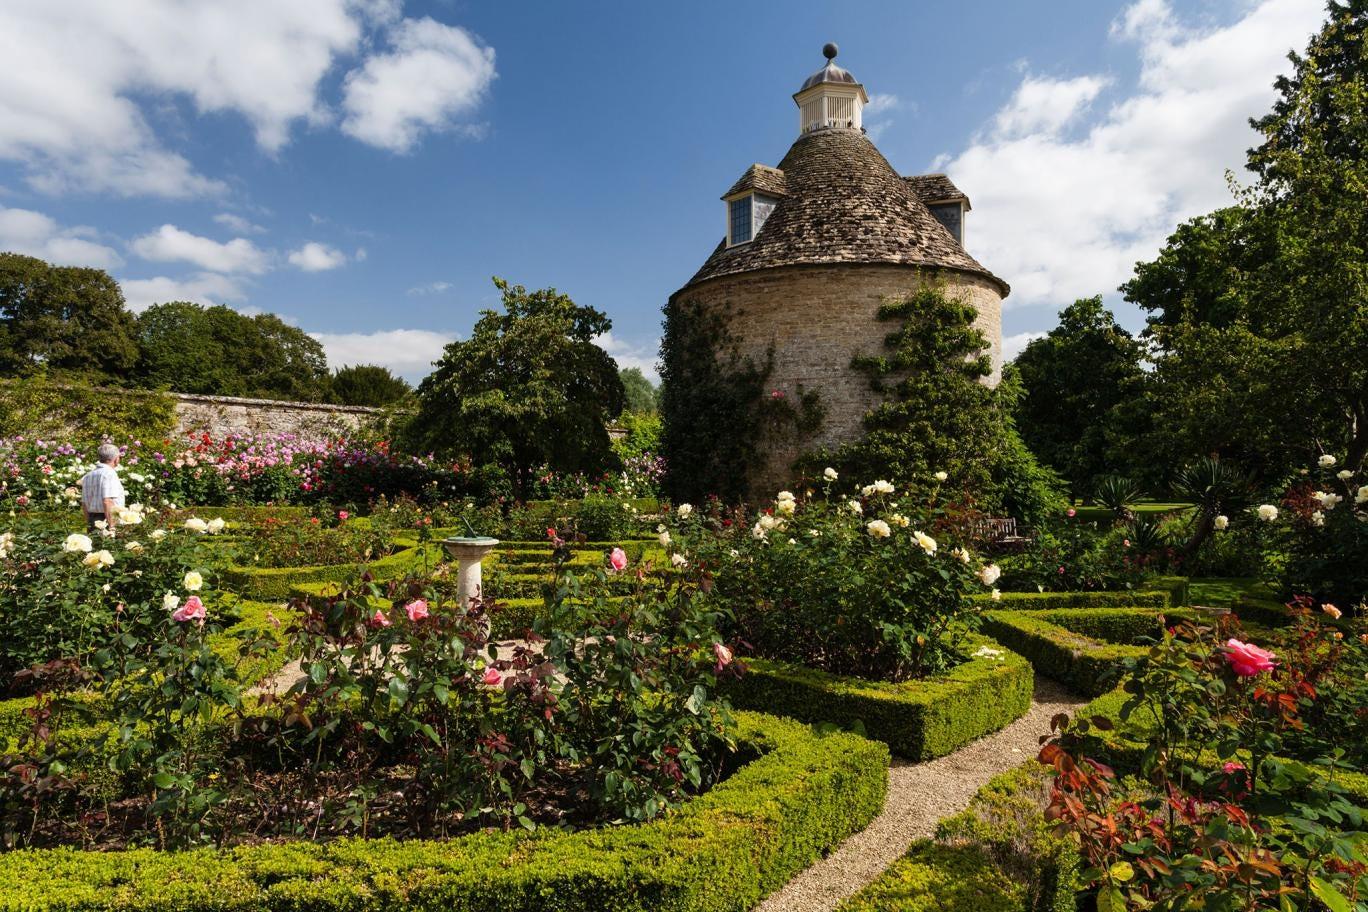 In full bloom: The Rose Parterre at Rousham House